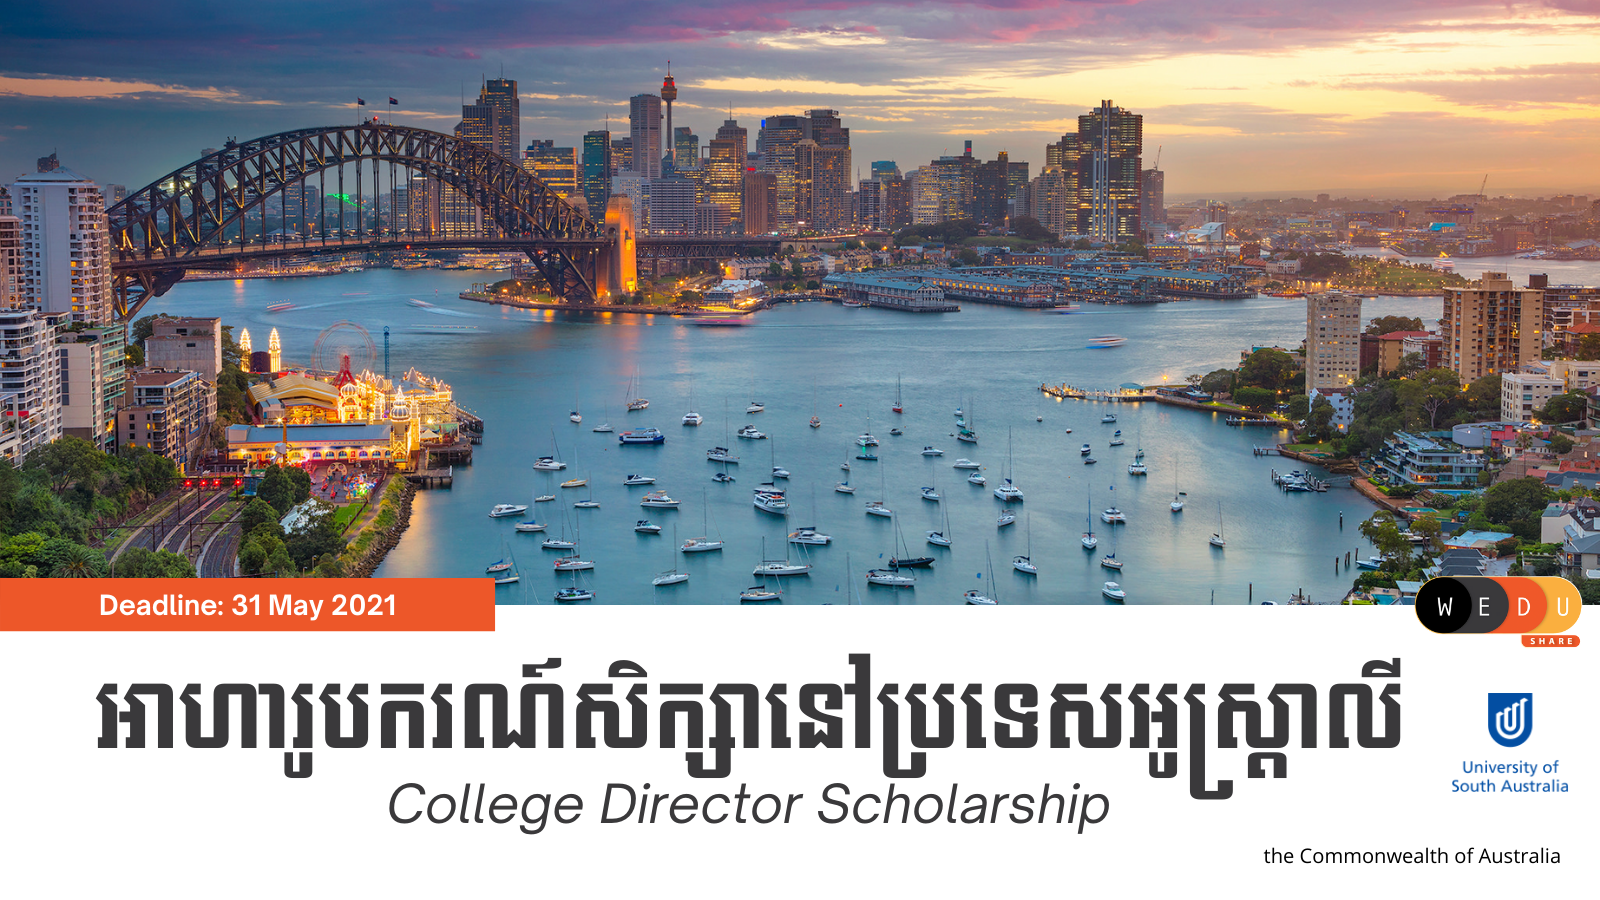 College Director Scholarship